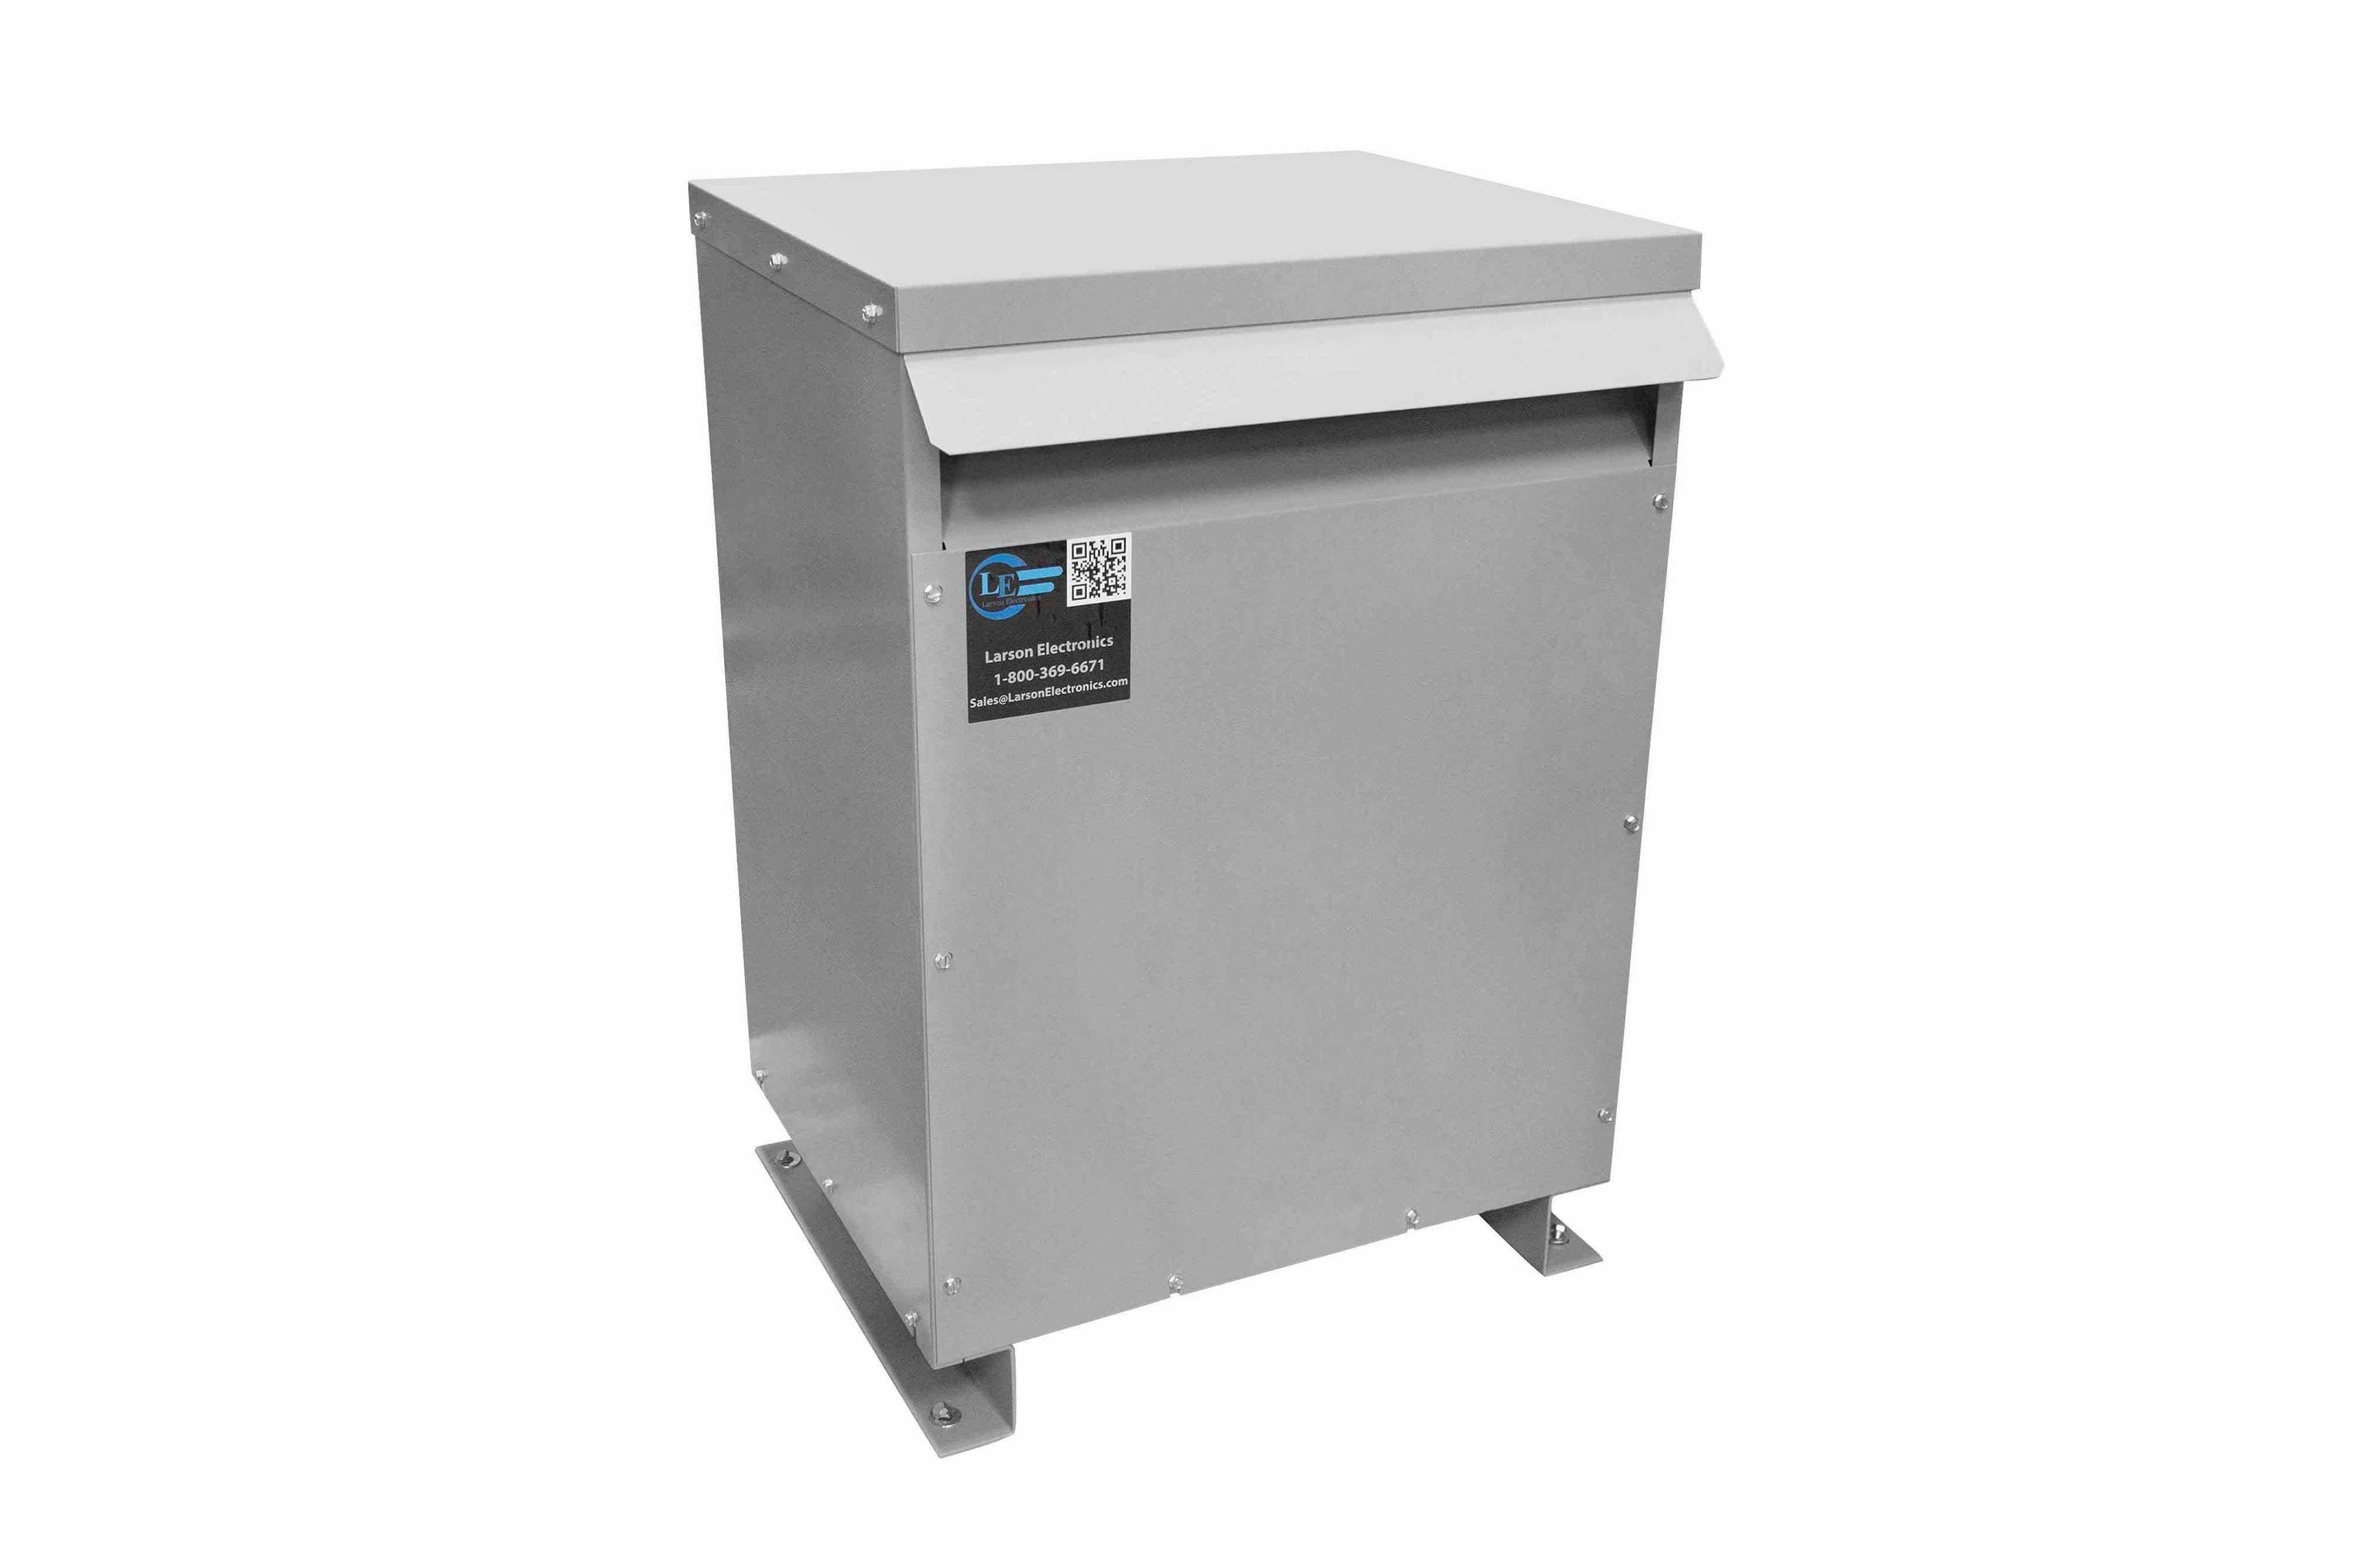 18 kVA 3PH Isolation Transformer, 460V Wye Primary, 400Y/231 Wye-N Secondary, N3R, Ventilated, 60 Hz